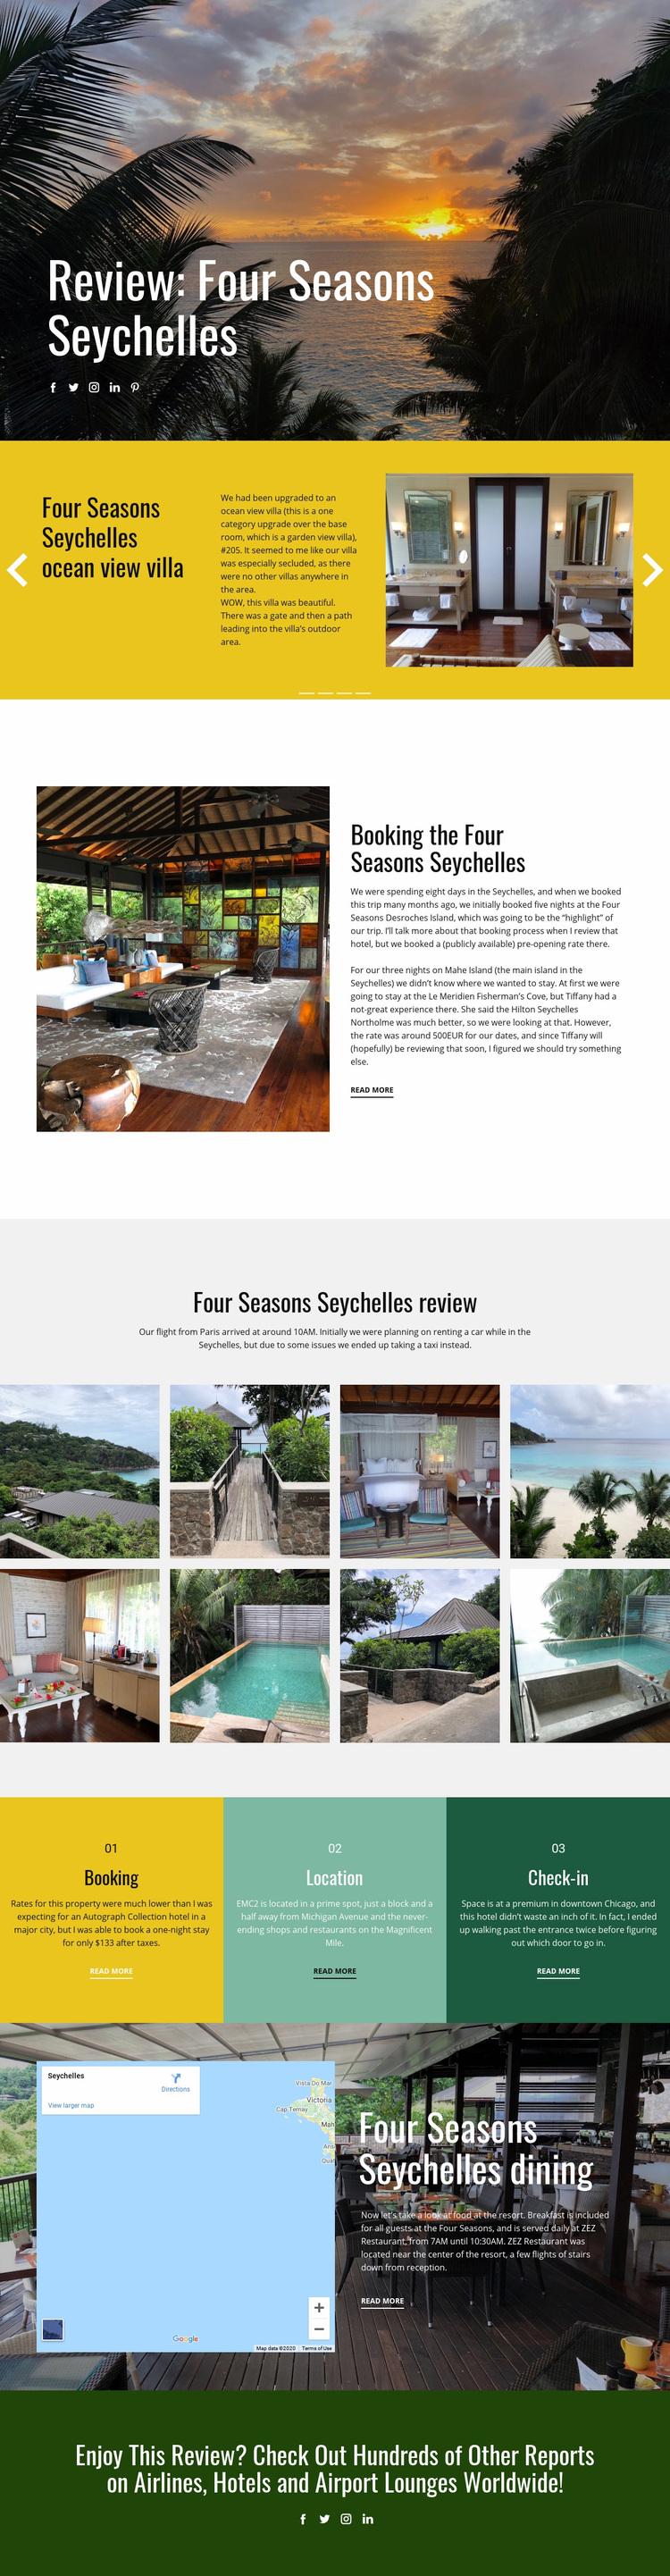 Four Seasons Web Page Designer